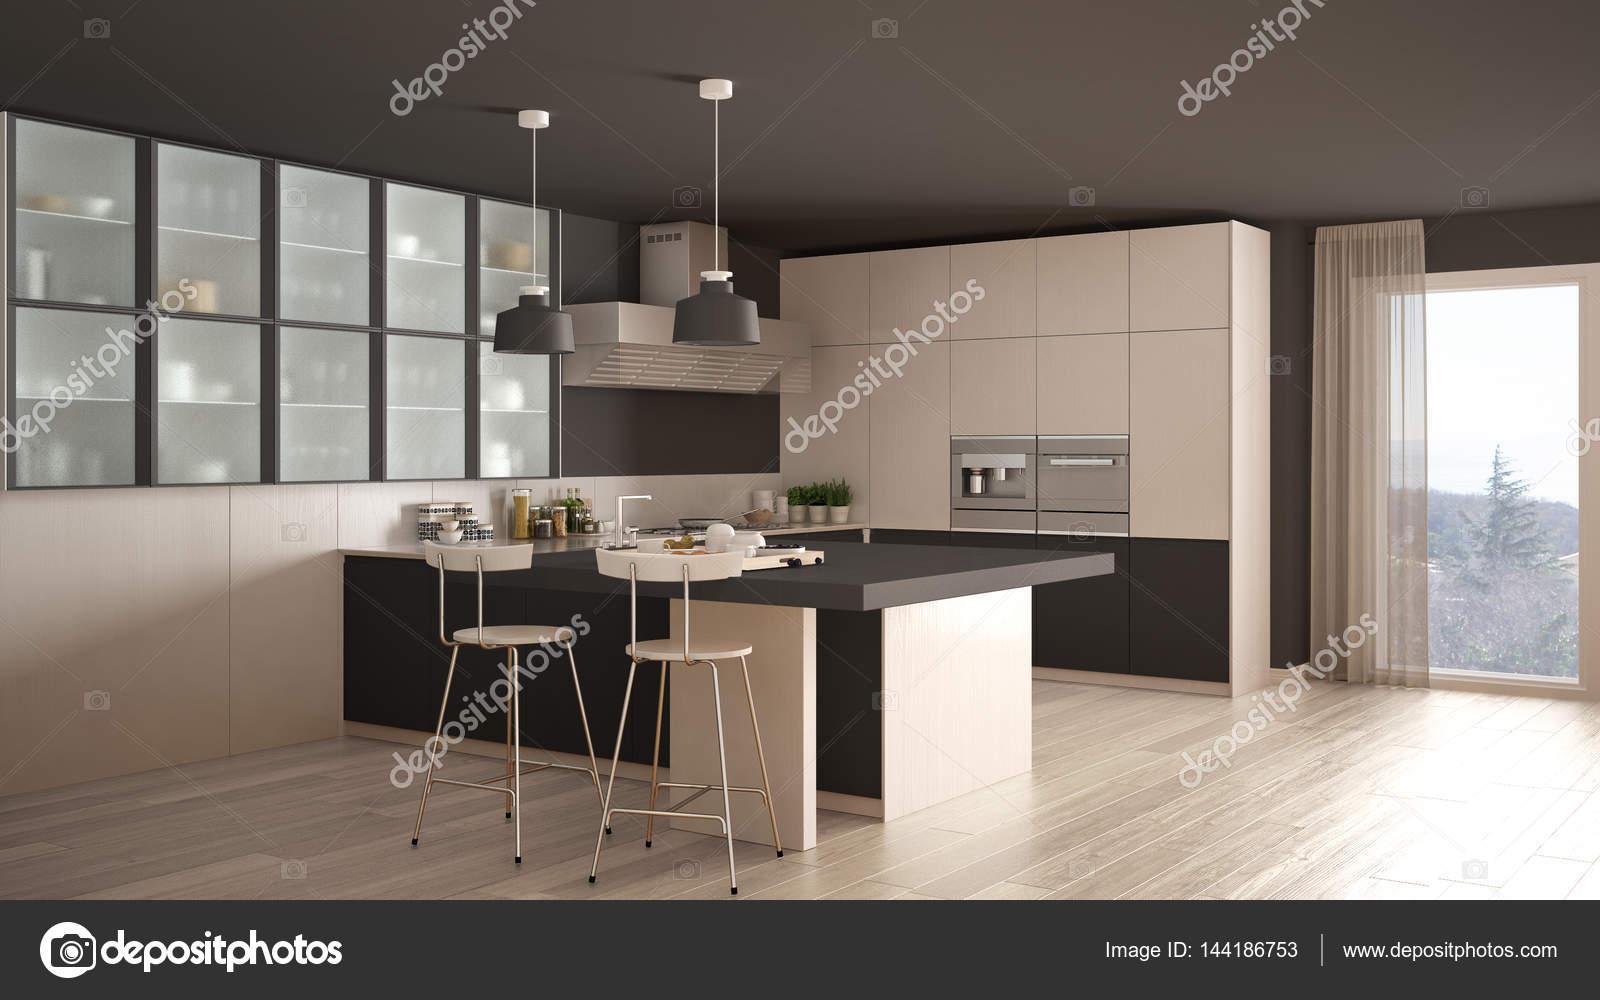 Pavimento Bianco E Grigio : Cucina classica minimal bianco e grigio con pavimento in parquet